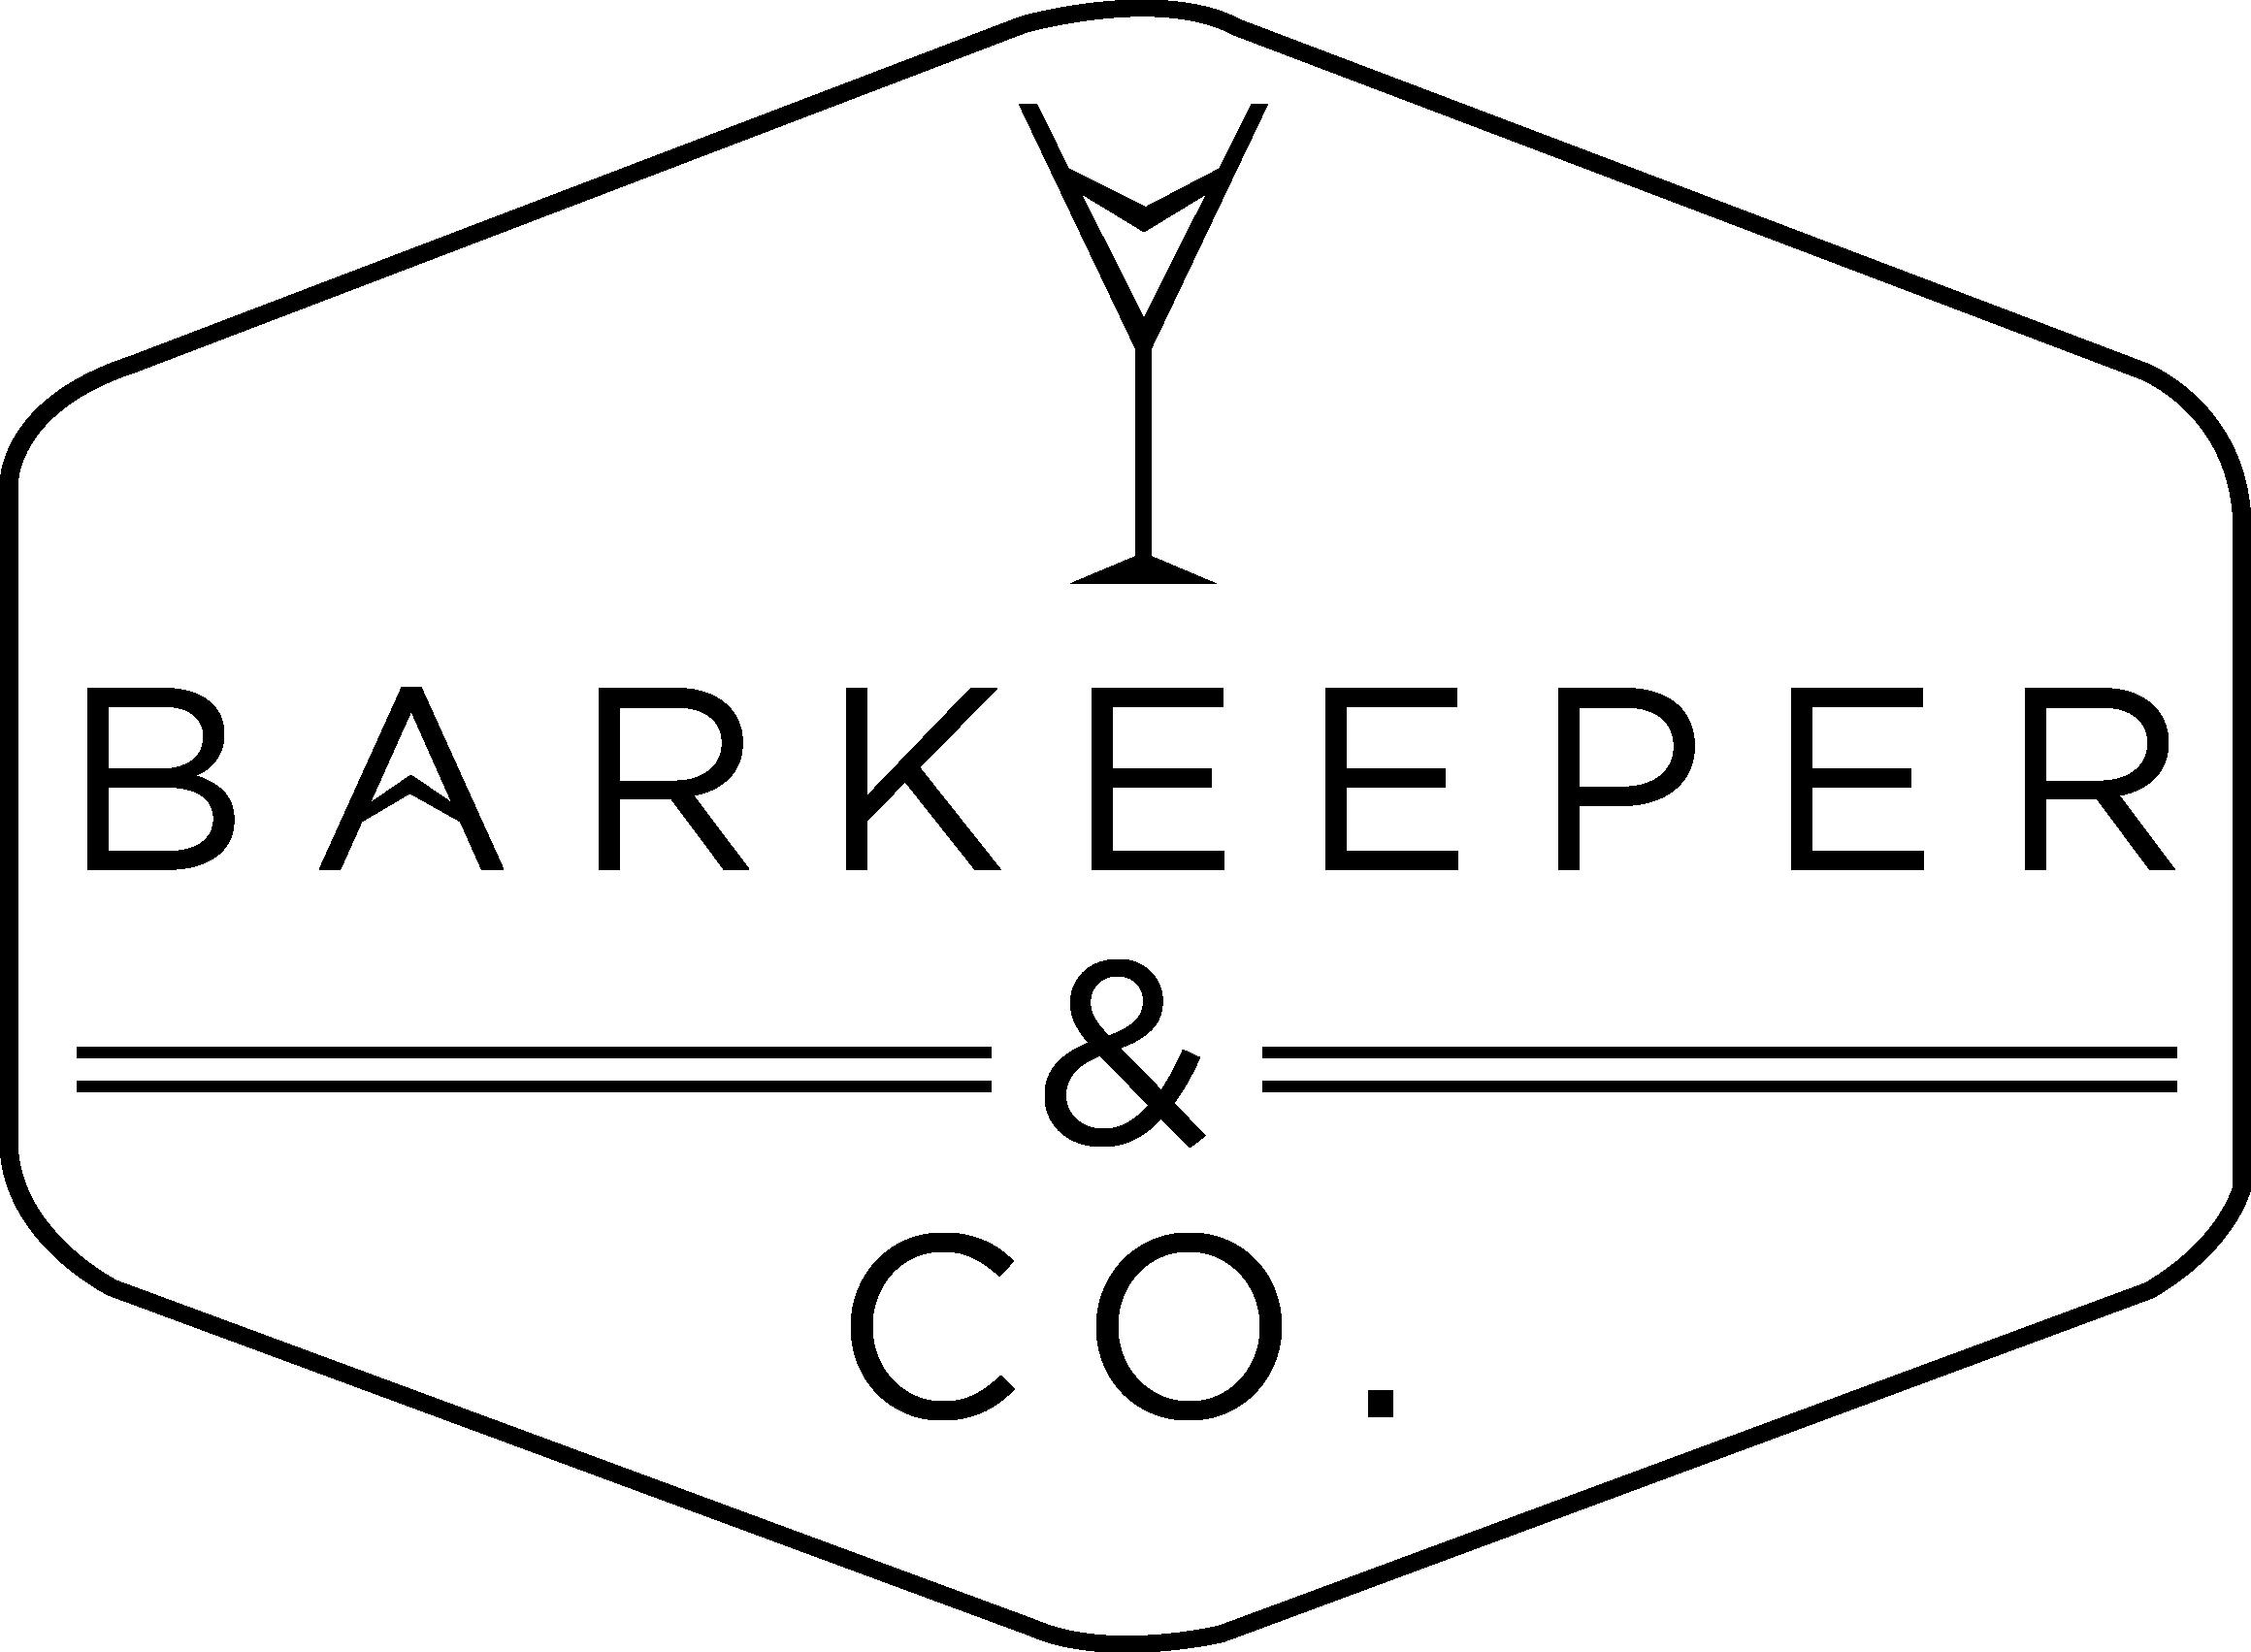 Logo Design by Florian Lagadic - Entry No. 177 in the Logo Design Contest Artistic Logo Design.